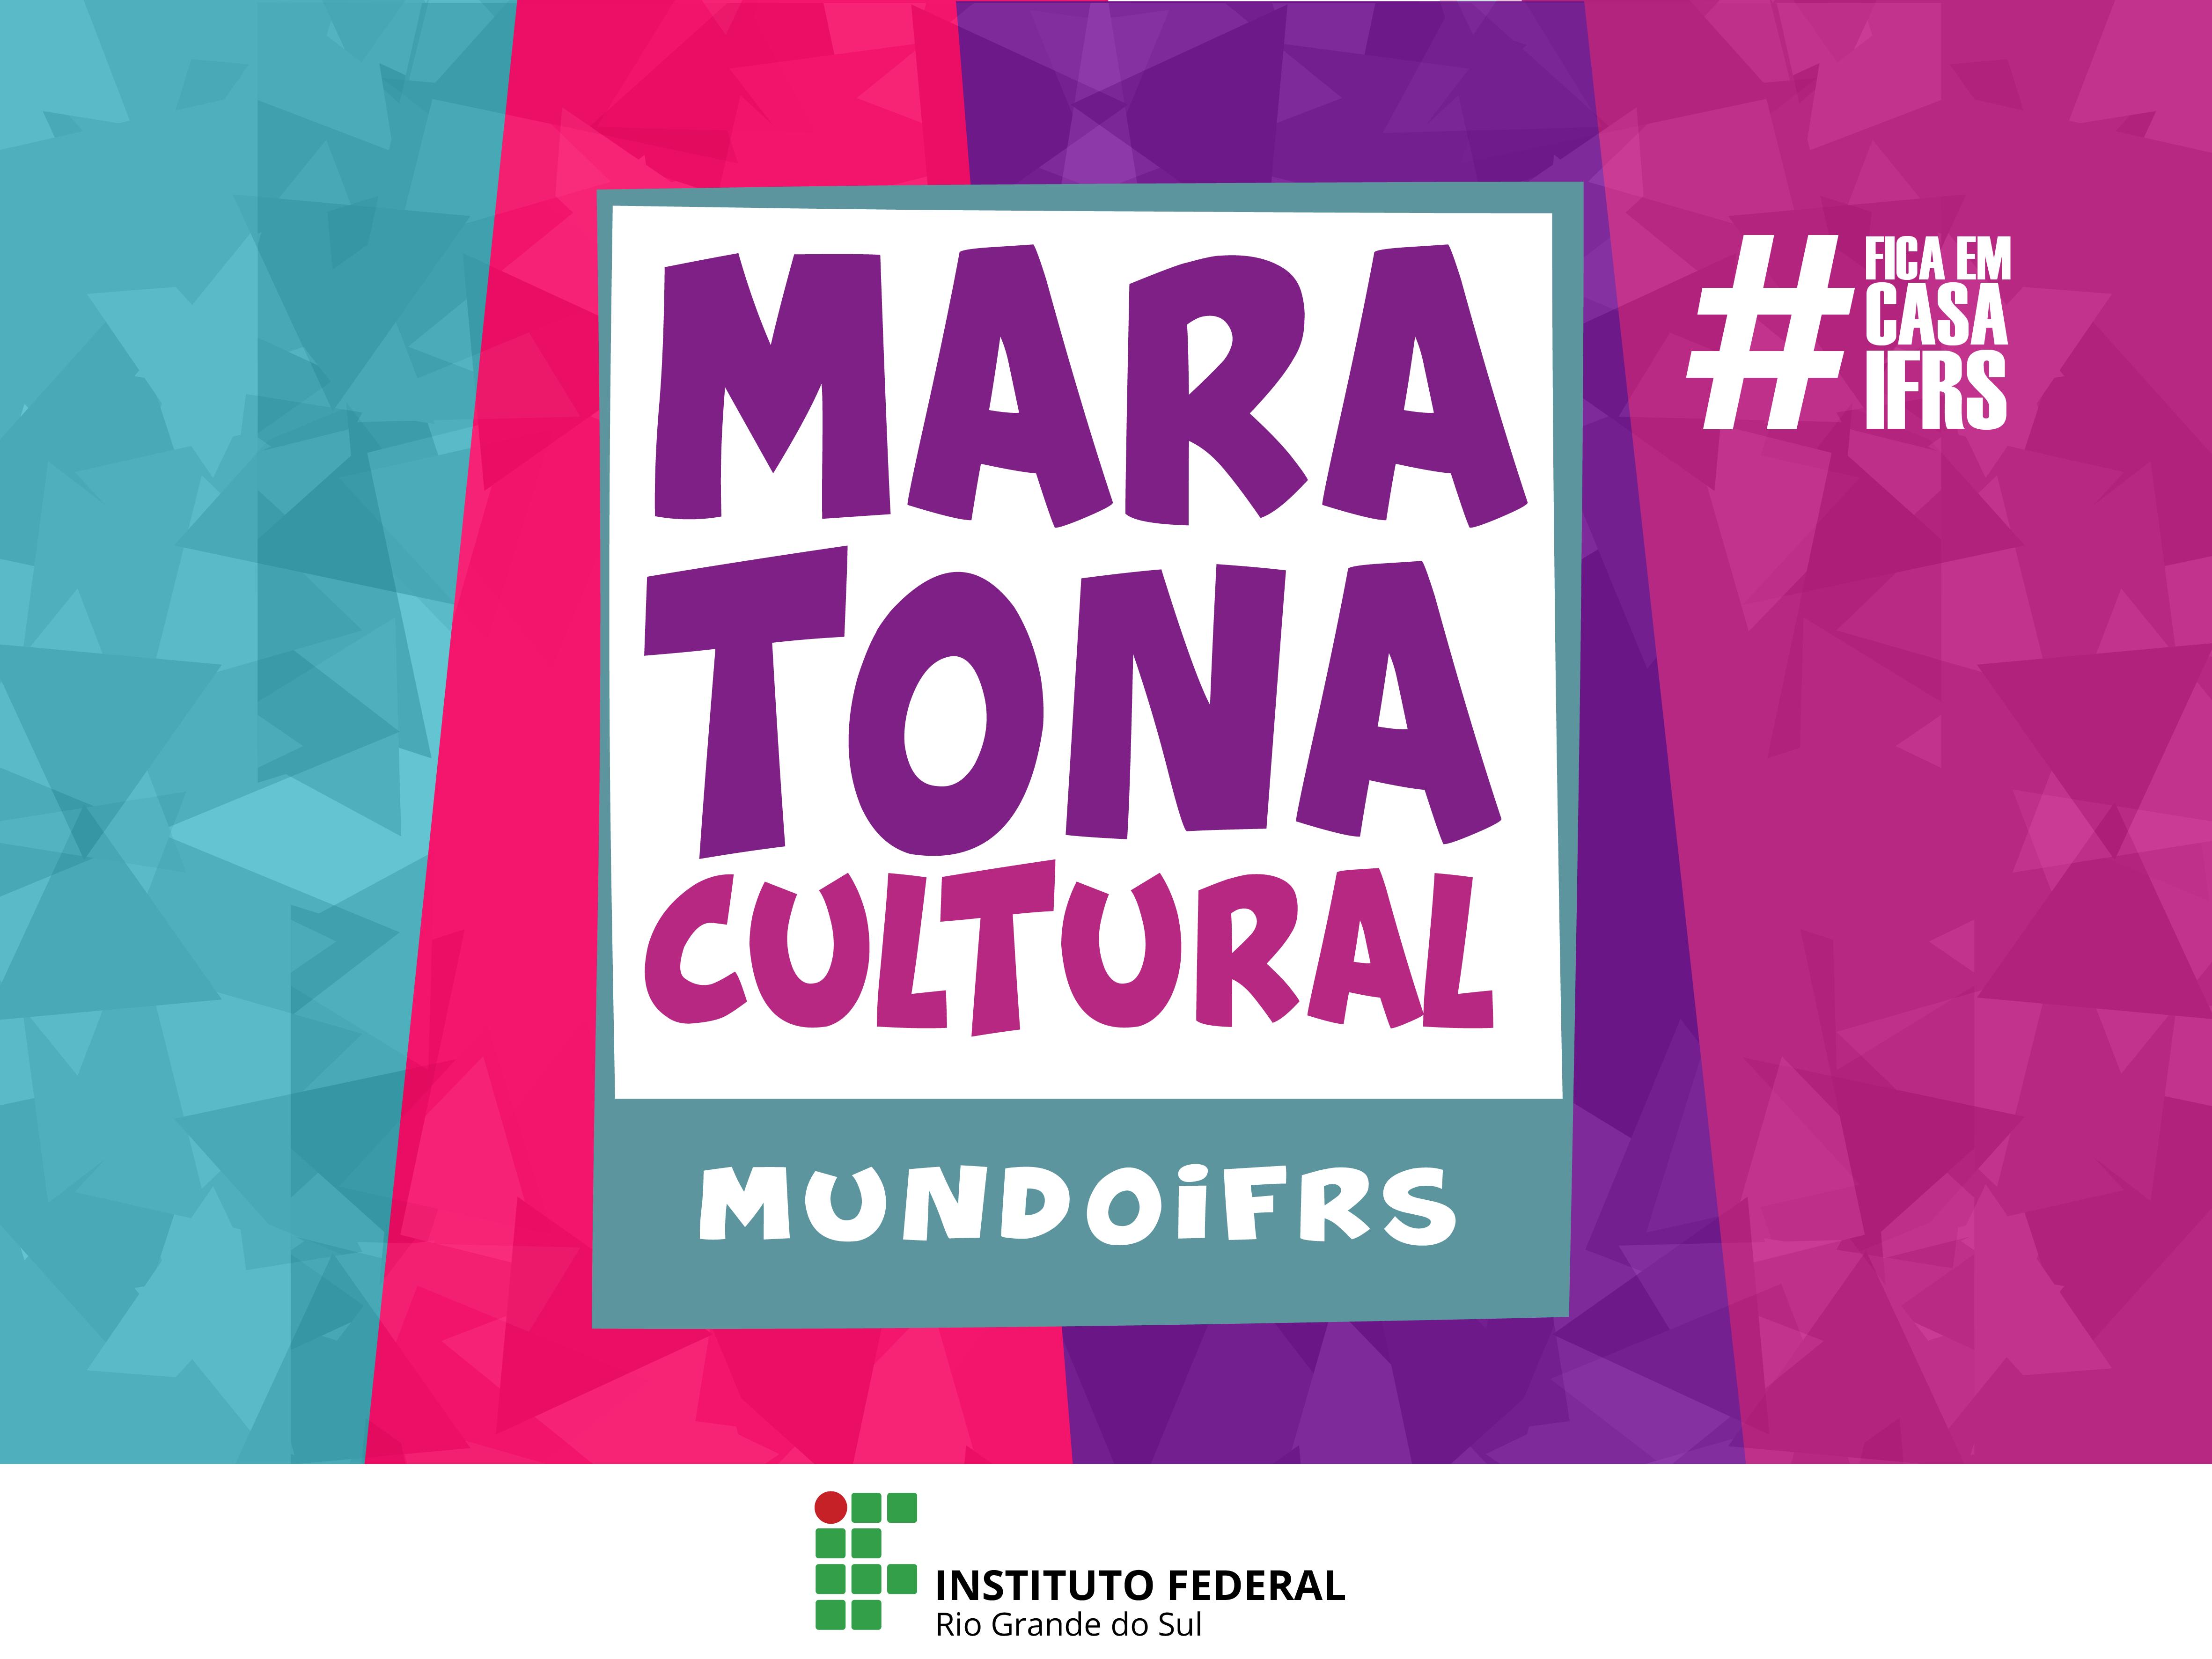 Informação textual Maratona Cultura MundoIFRS #FicaEmCasaIFRS